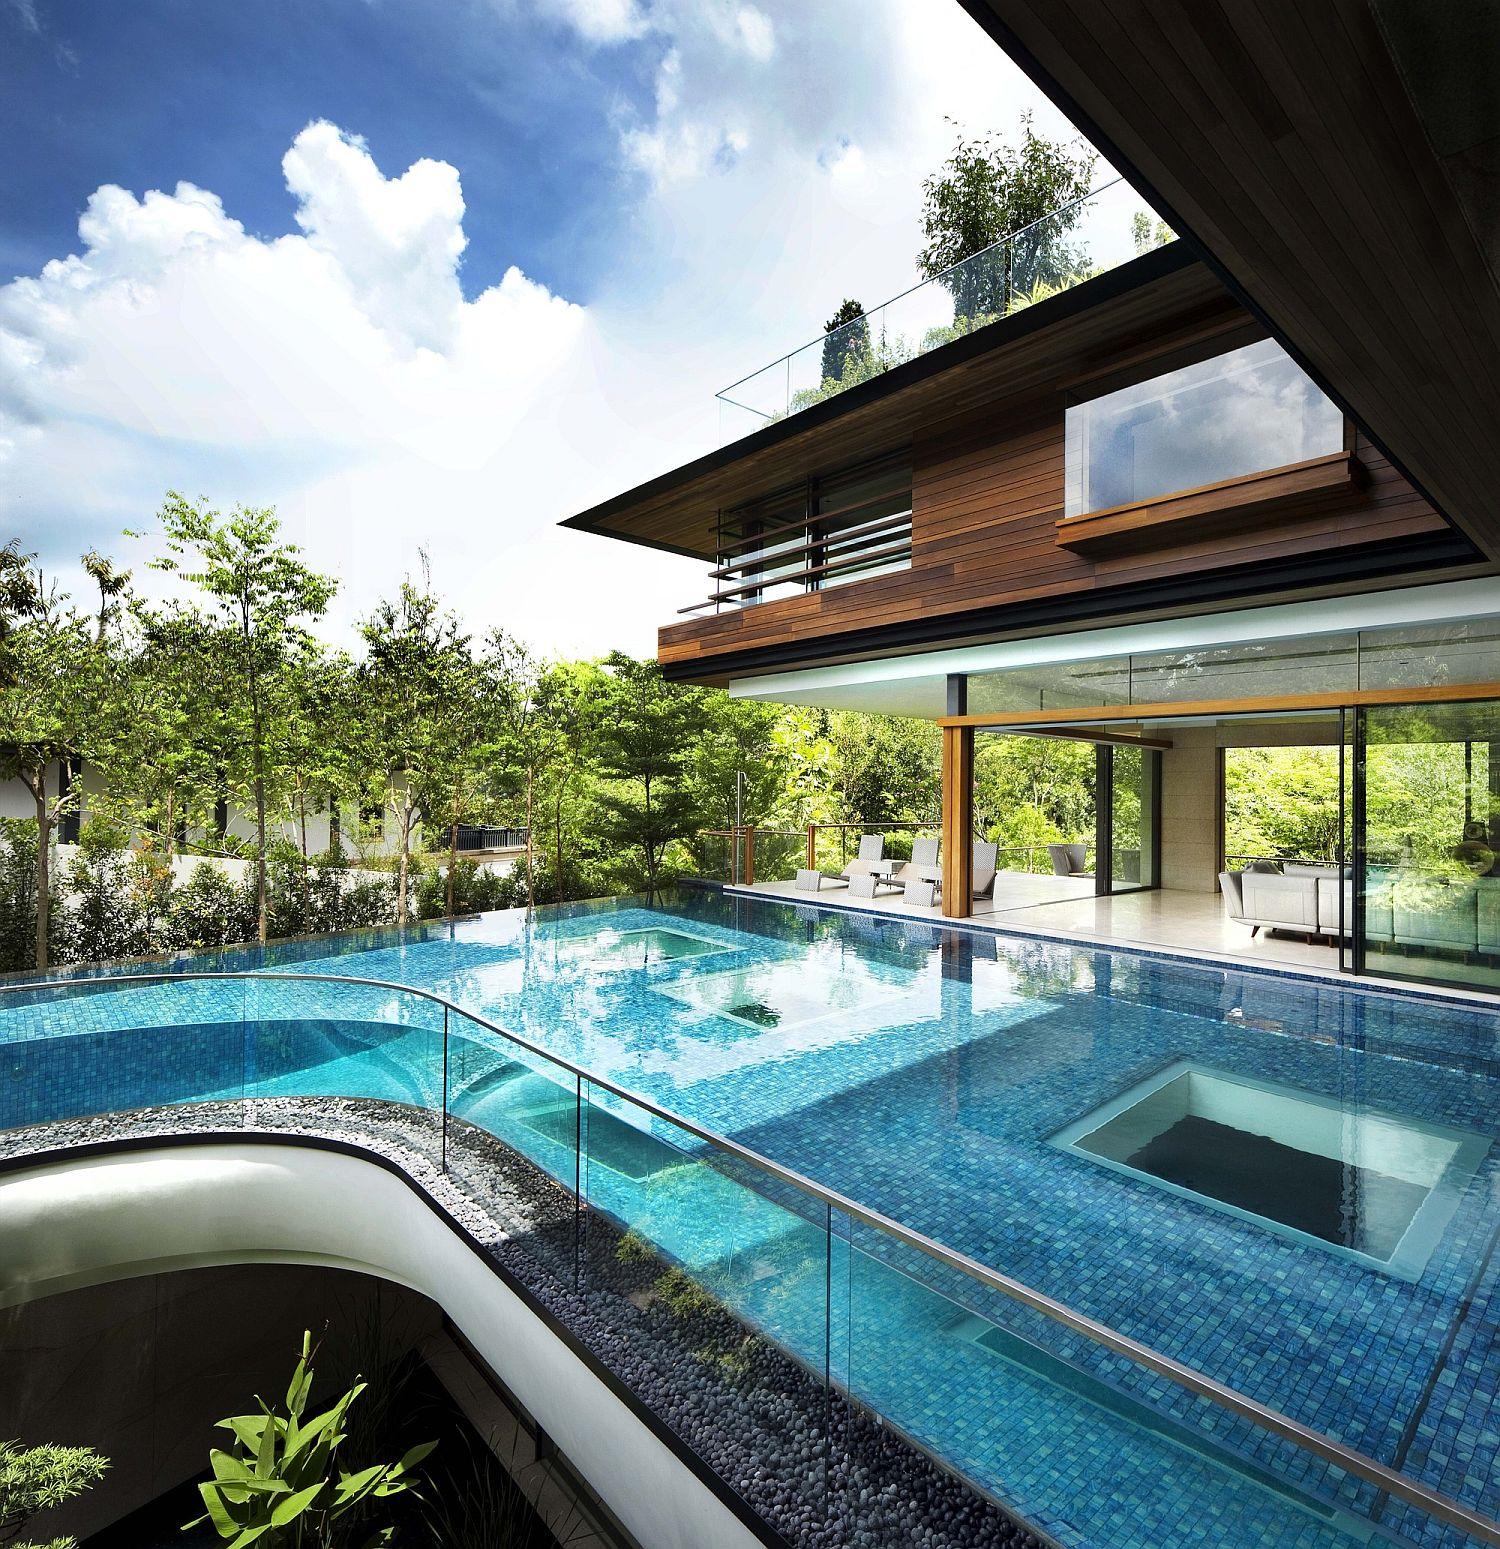 Botanica House designed by Guz Architects in Singapore